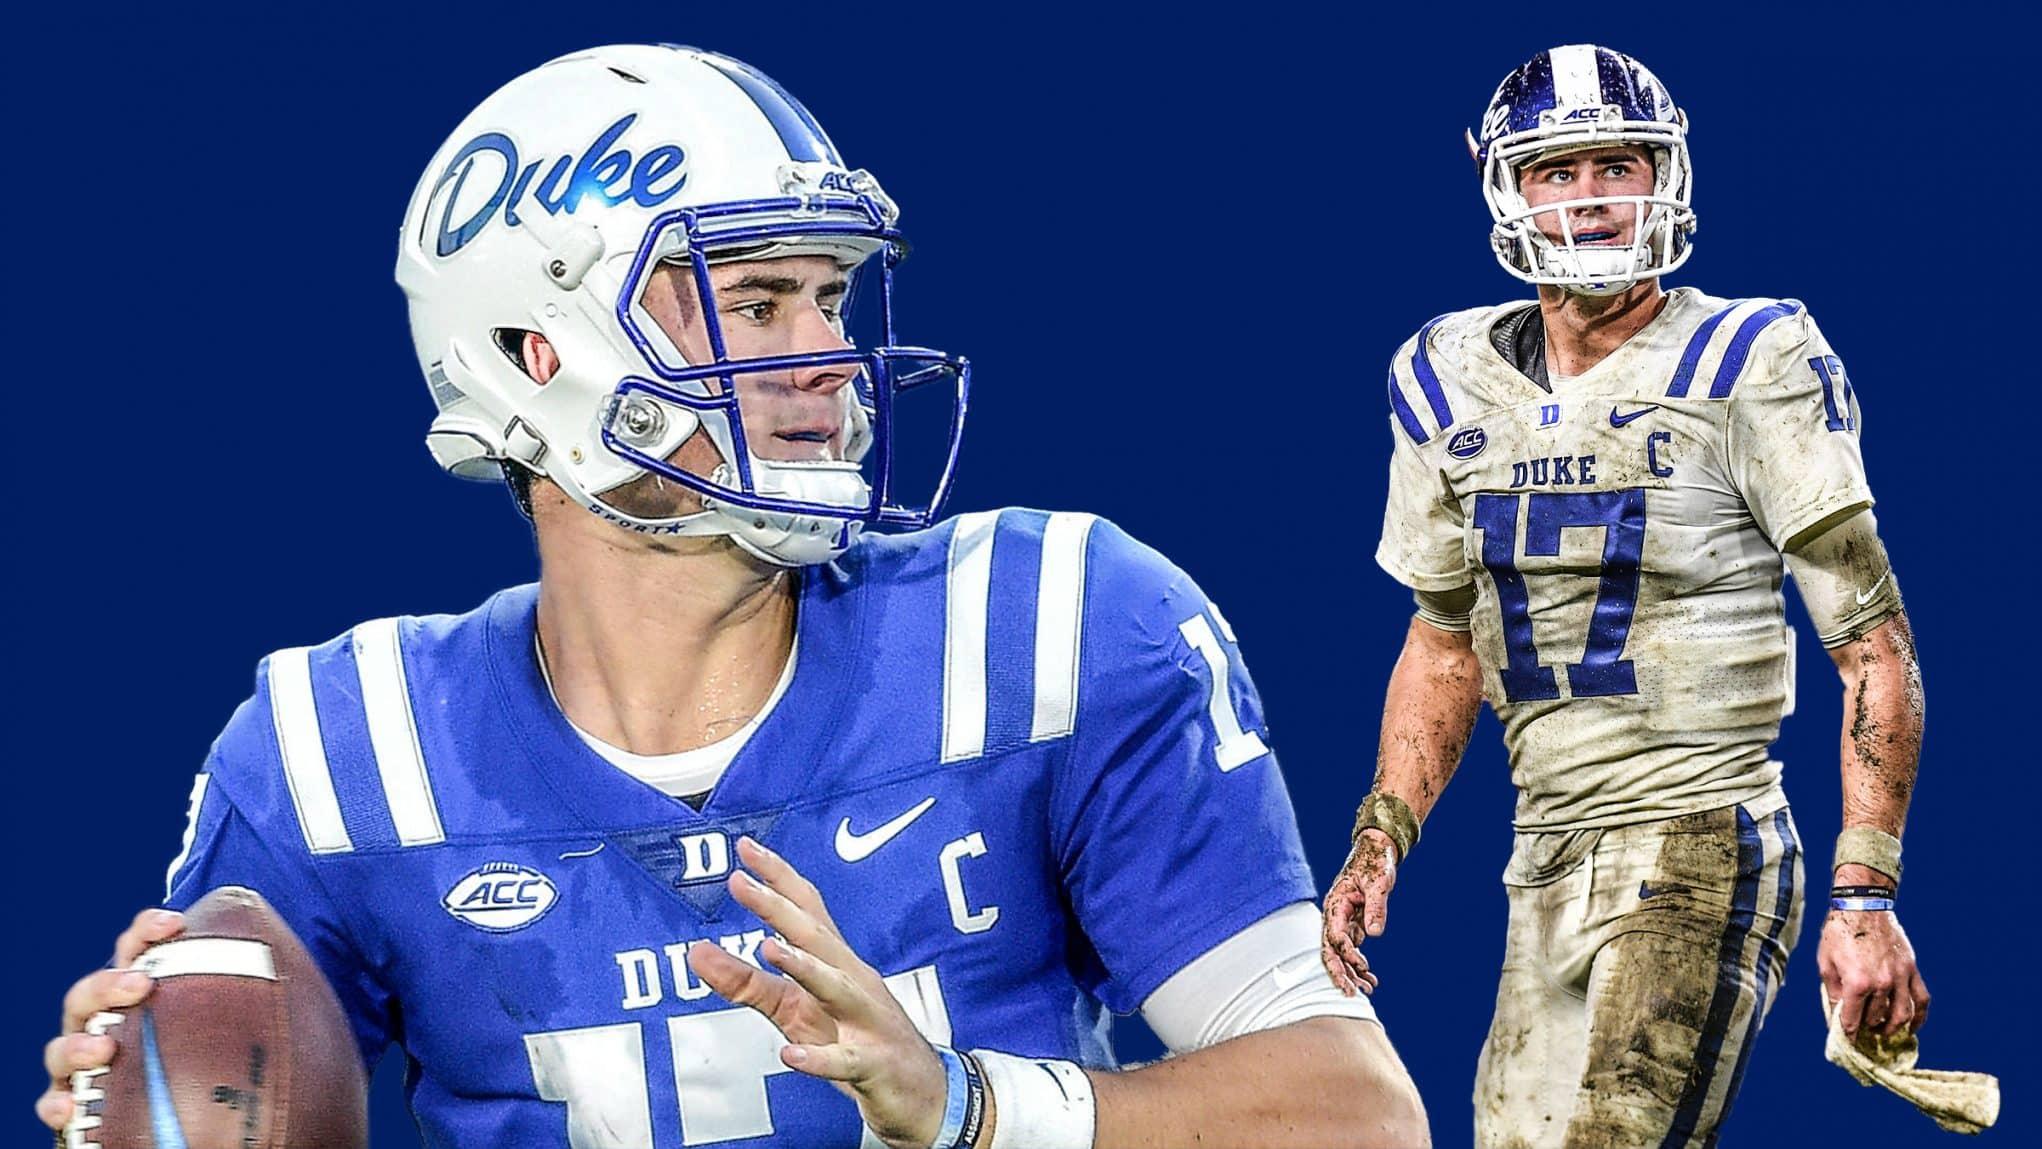 e4f9b373 NFL Draft: New York Giants select Duke QB Daniel Jones 6th overall